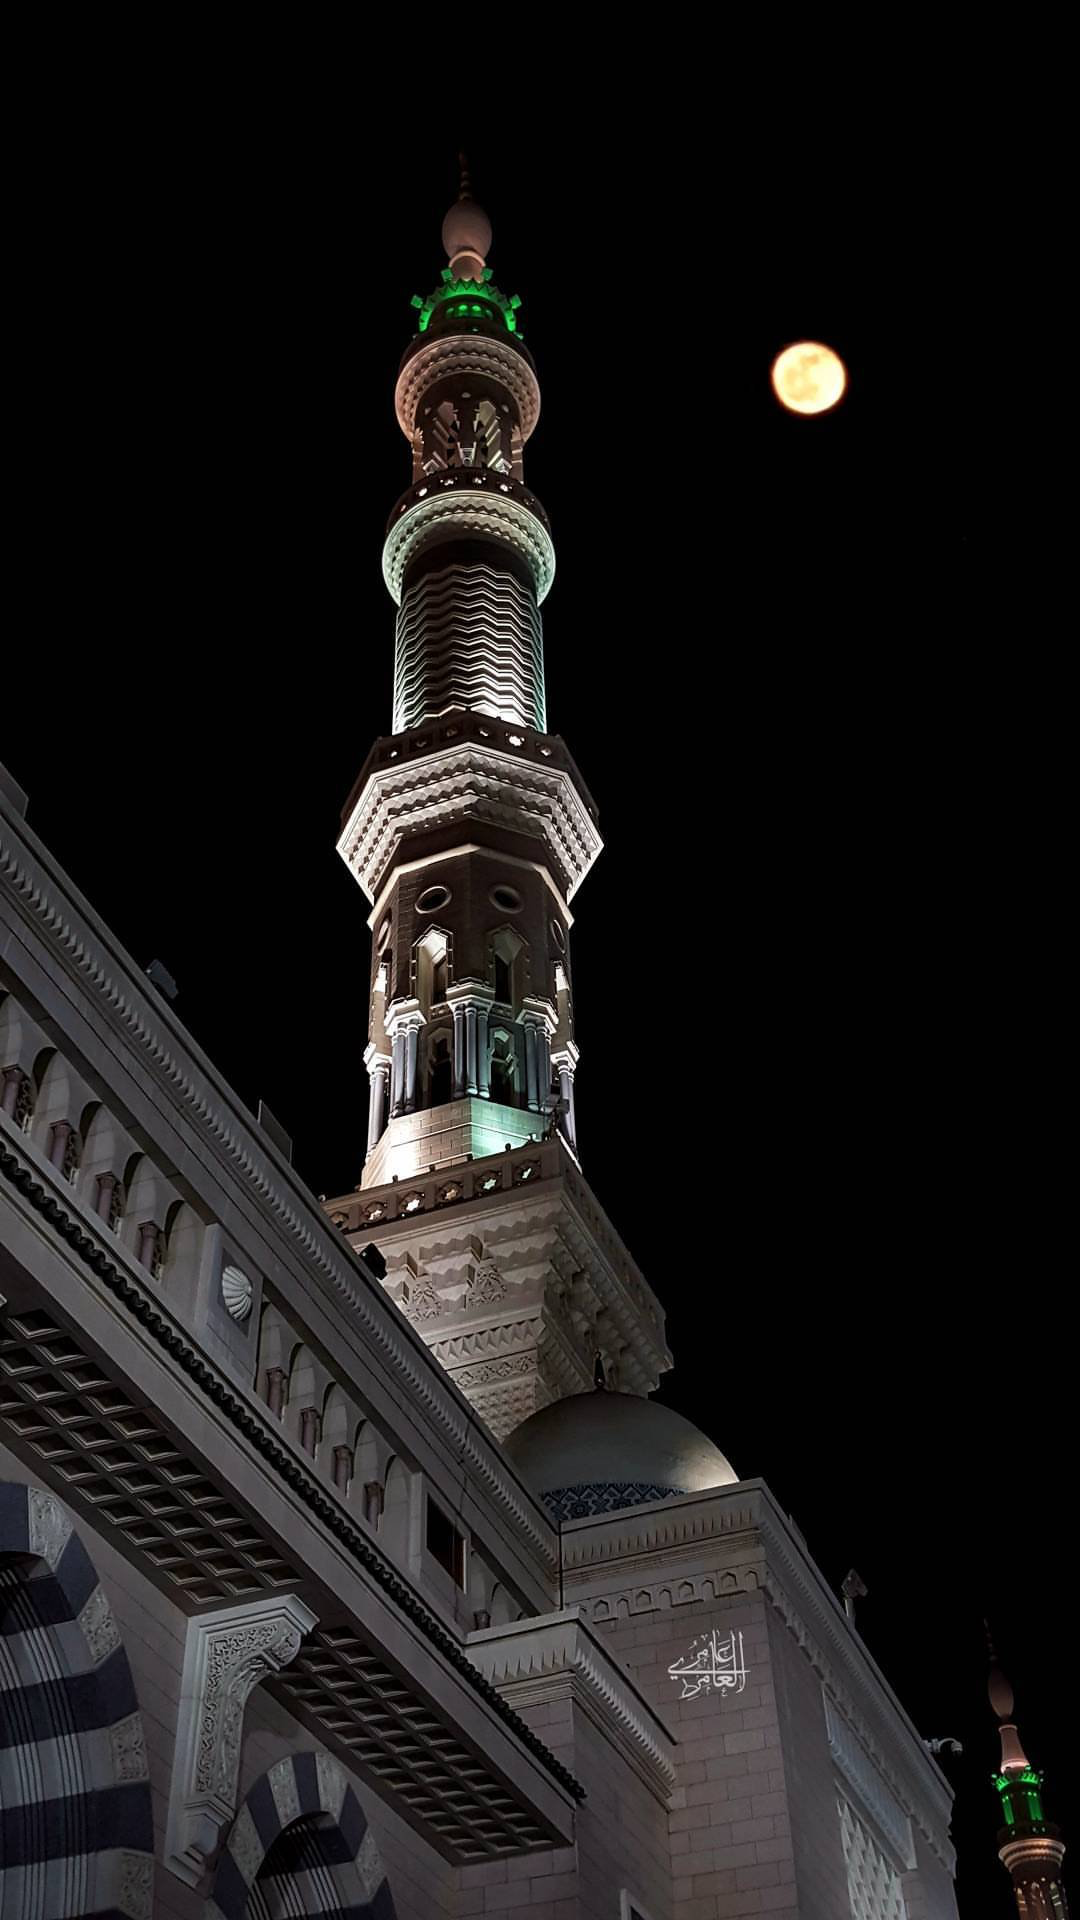 Pin Oleh Nan Ch Di صور Arsitektur Budaya Arsitektur Masjid Arsitektur Islamis